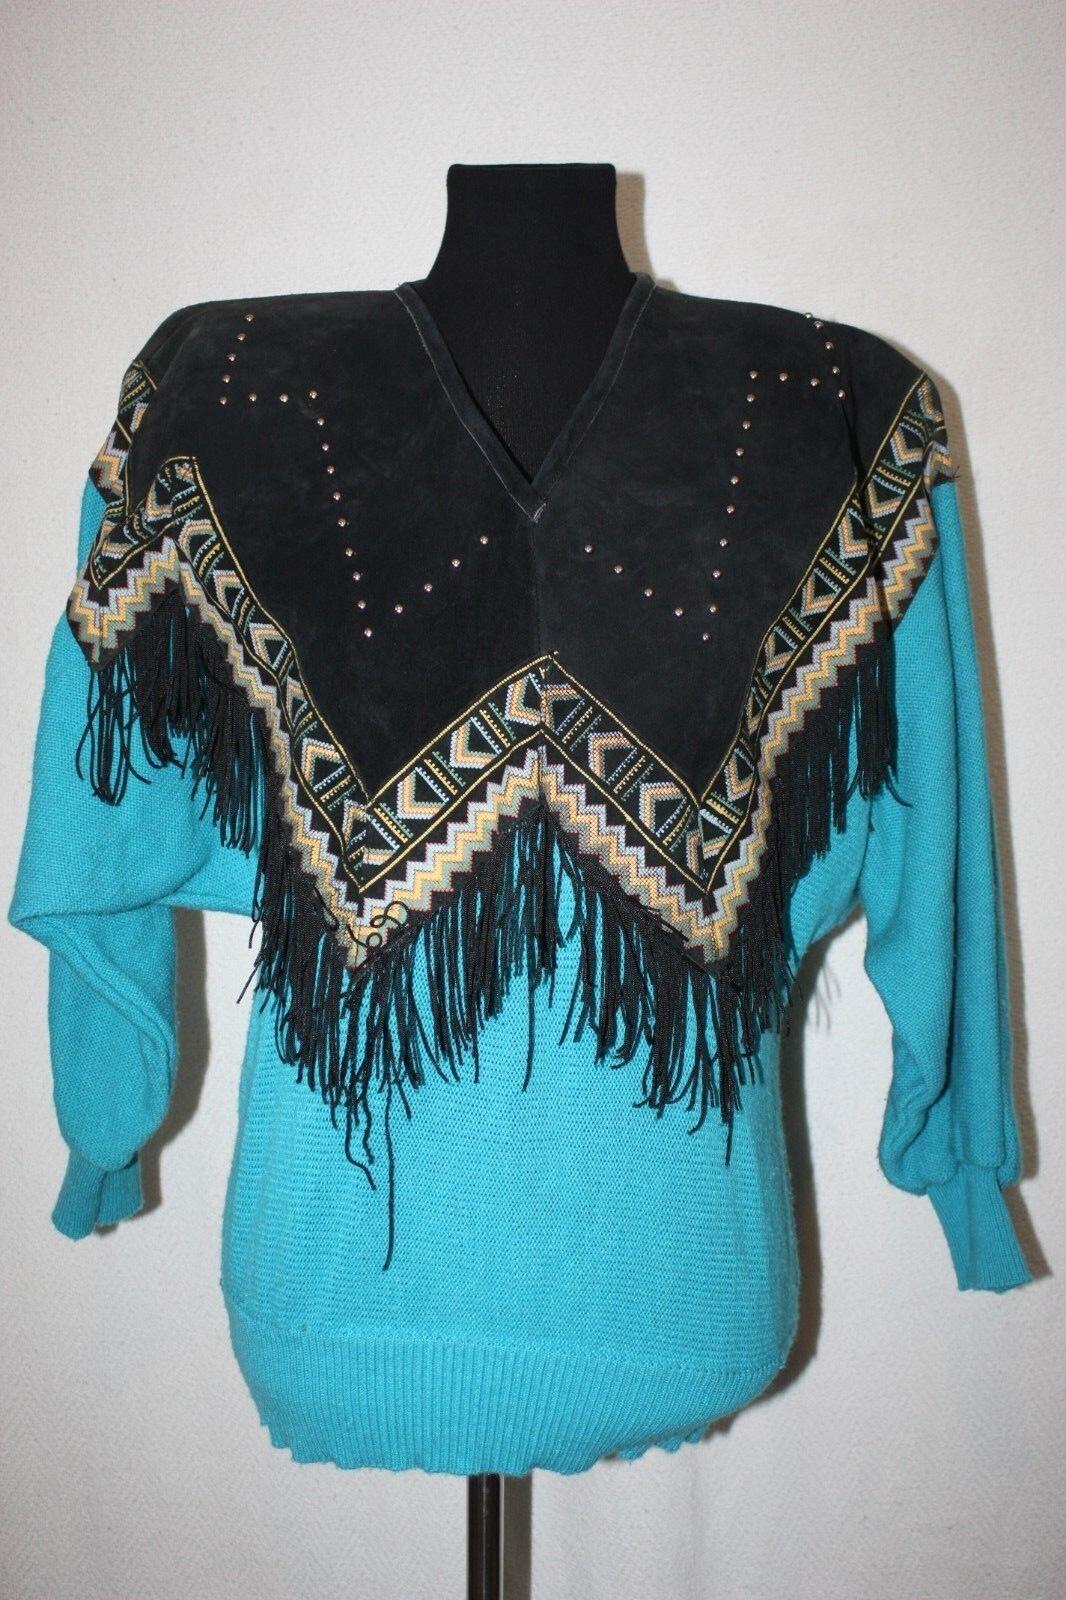 VTG Miller Outerwear Women Southwest Fringe Suede Teal Acrylic Sweater Sz L